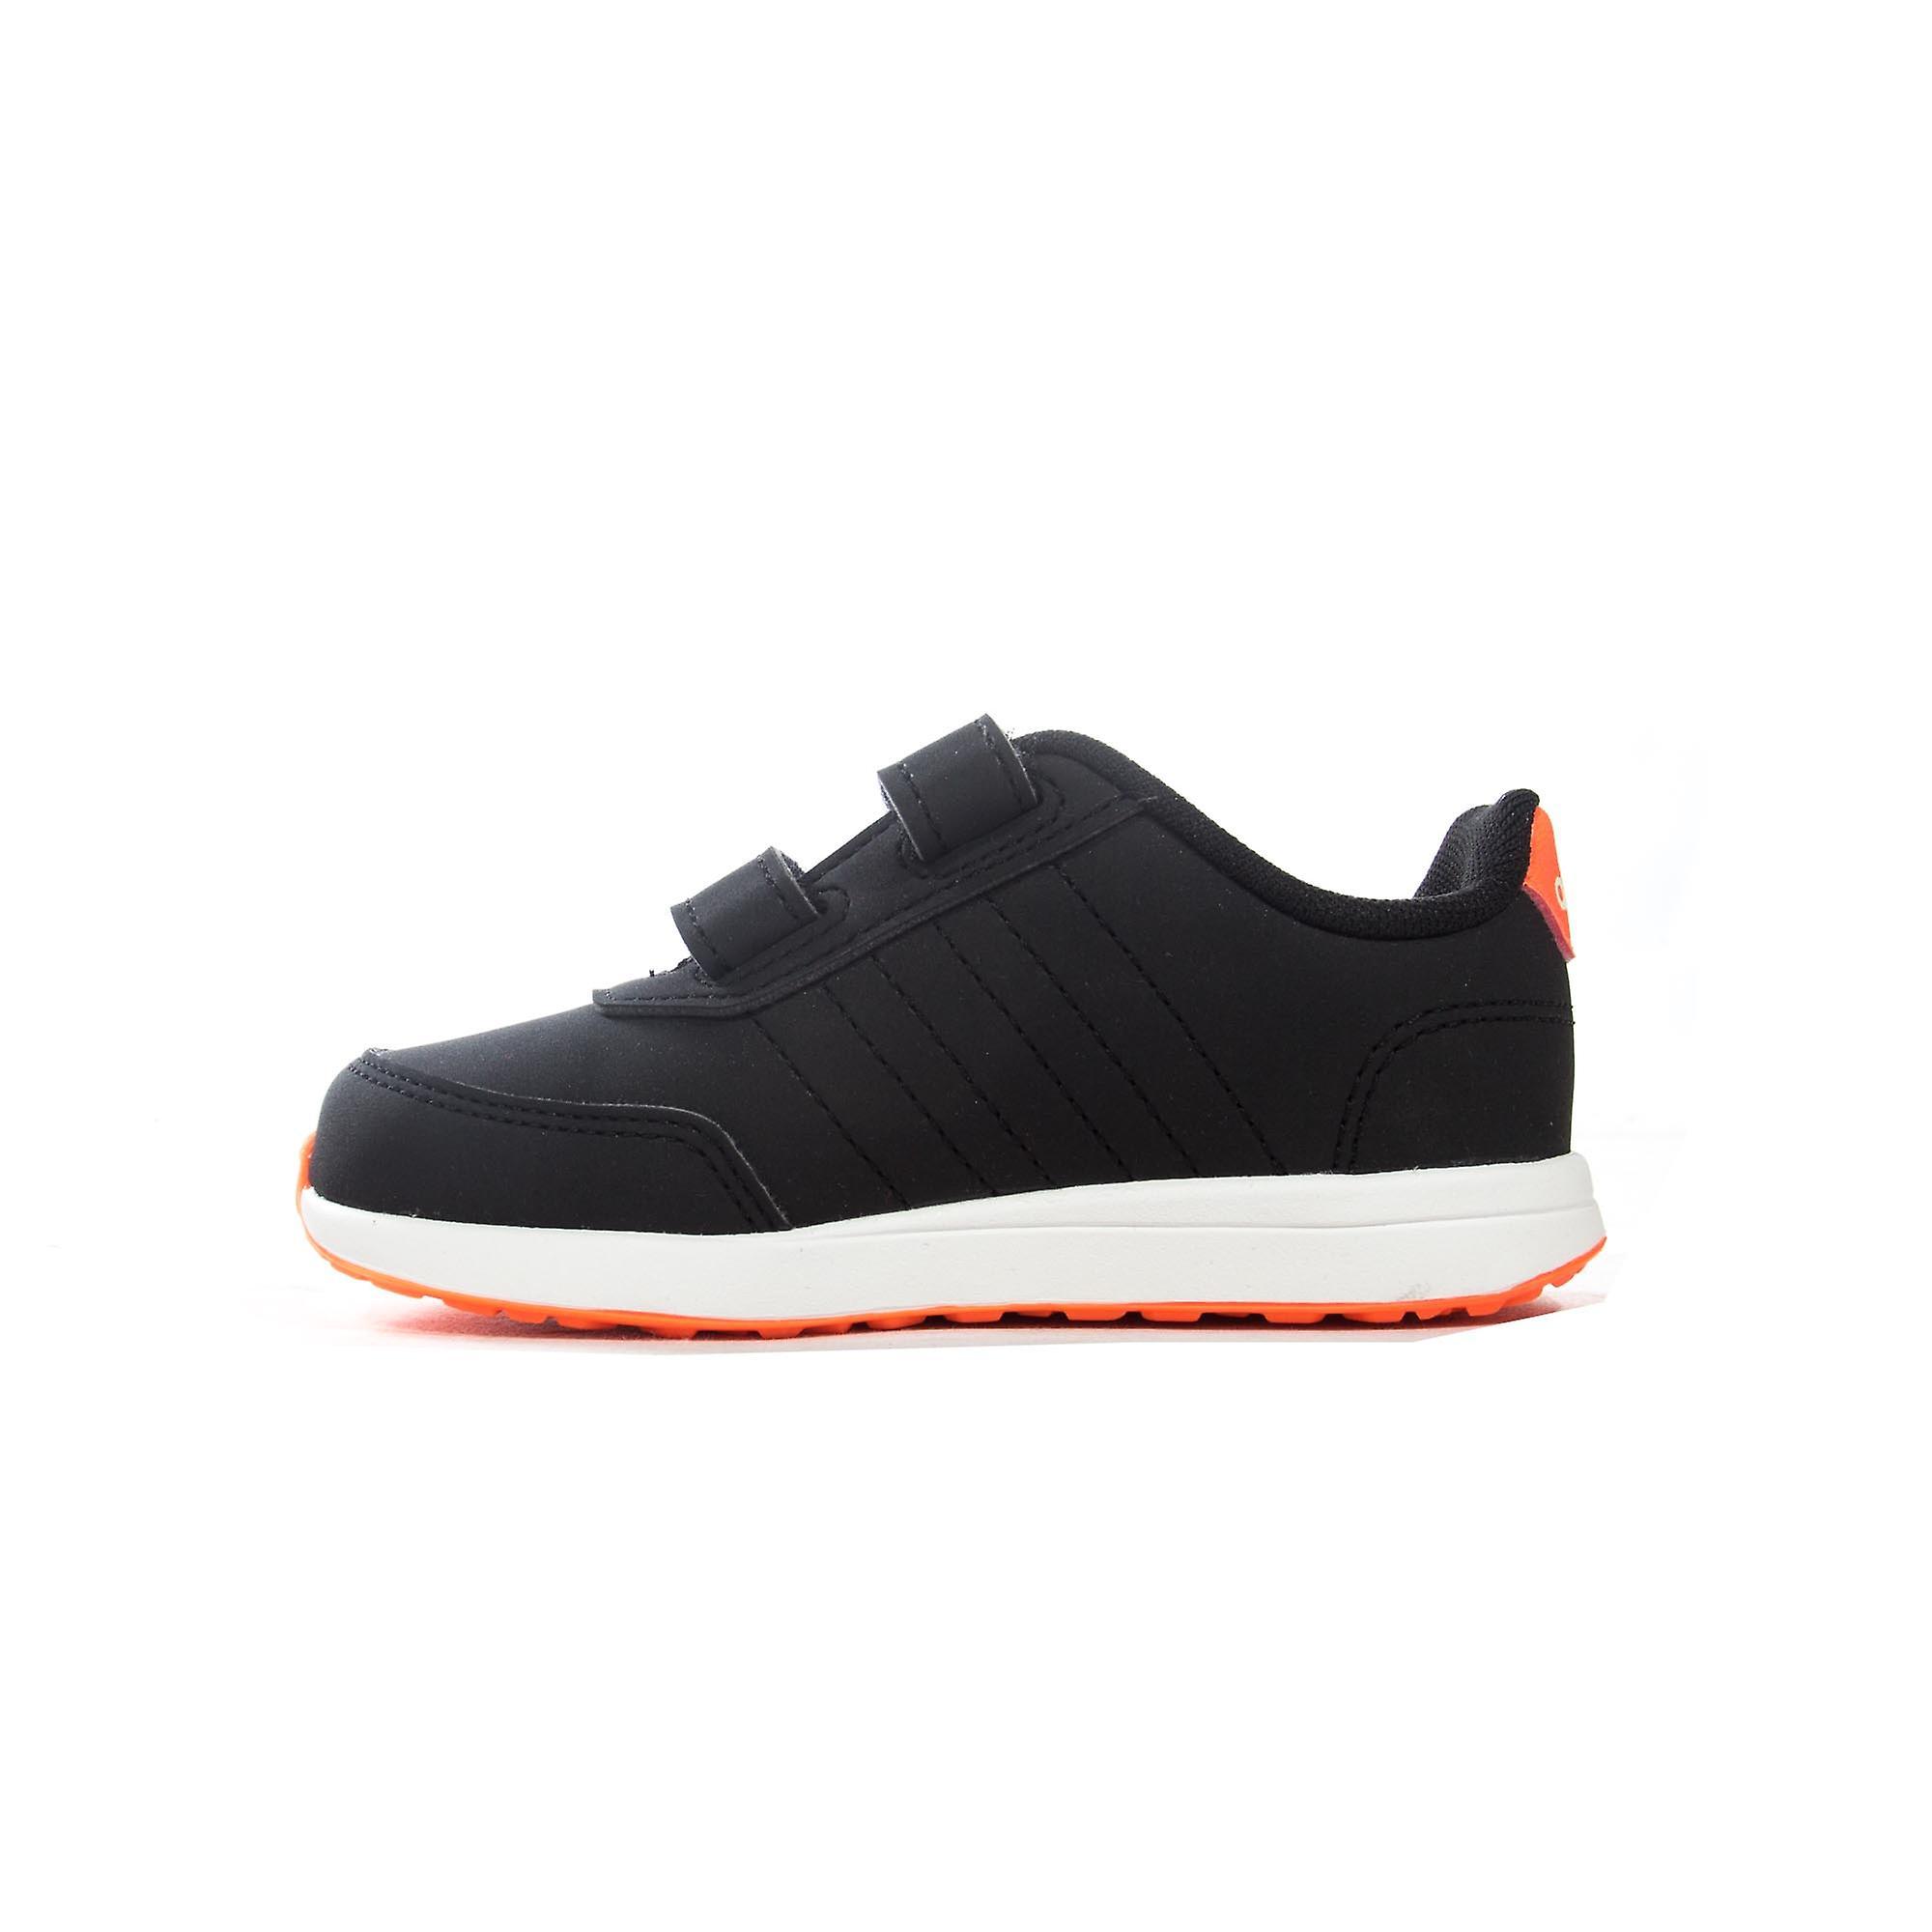 adidas VS Switch 2 Infant Kids Sports Trainer Shoe Black/Orange